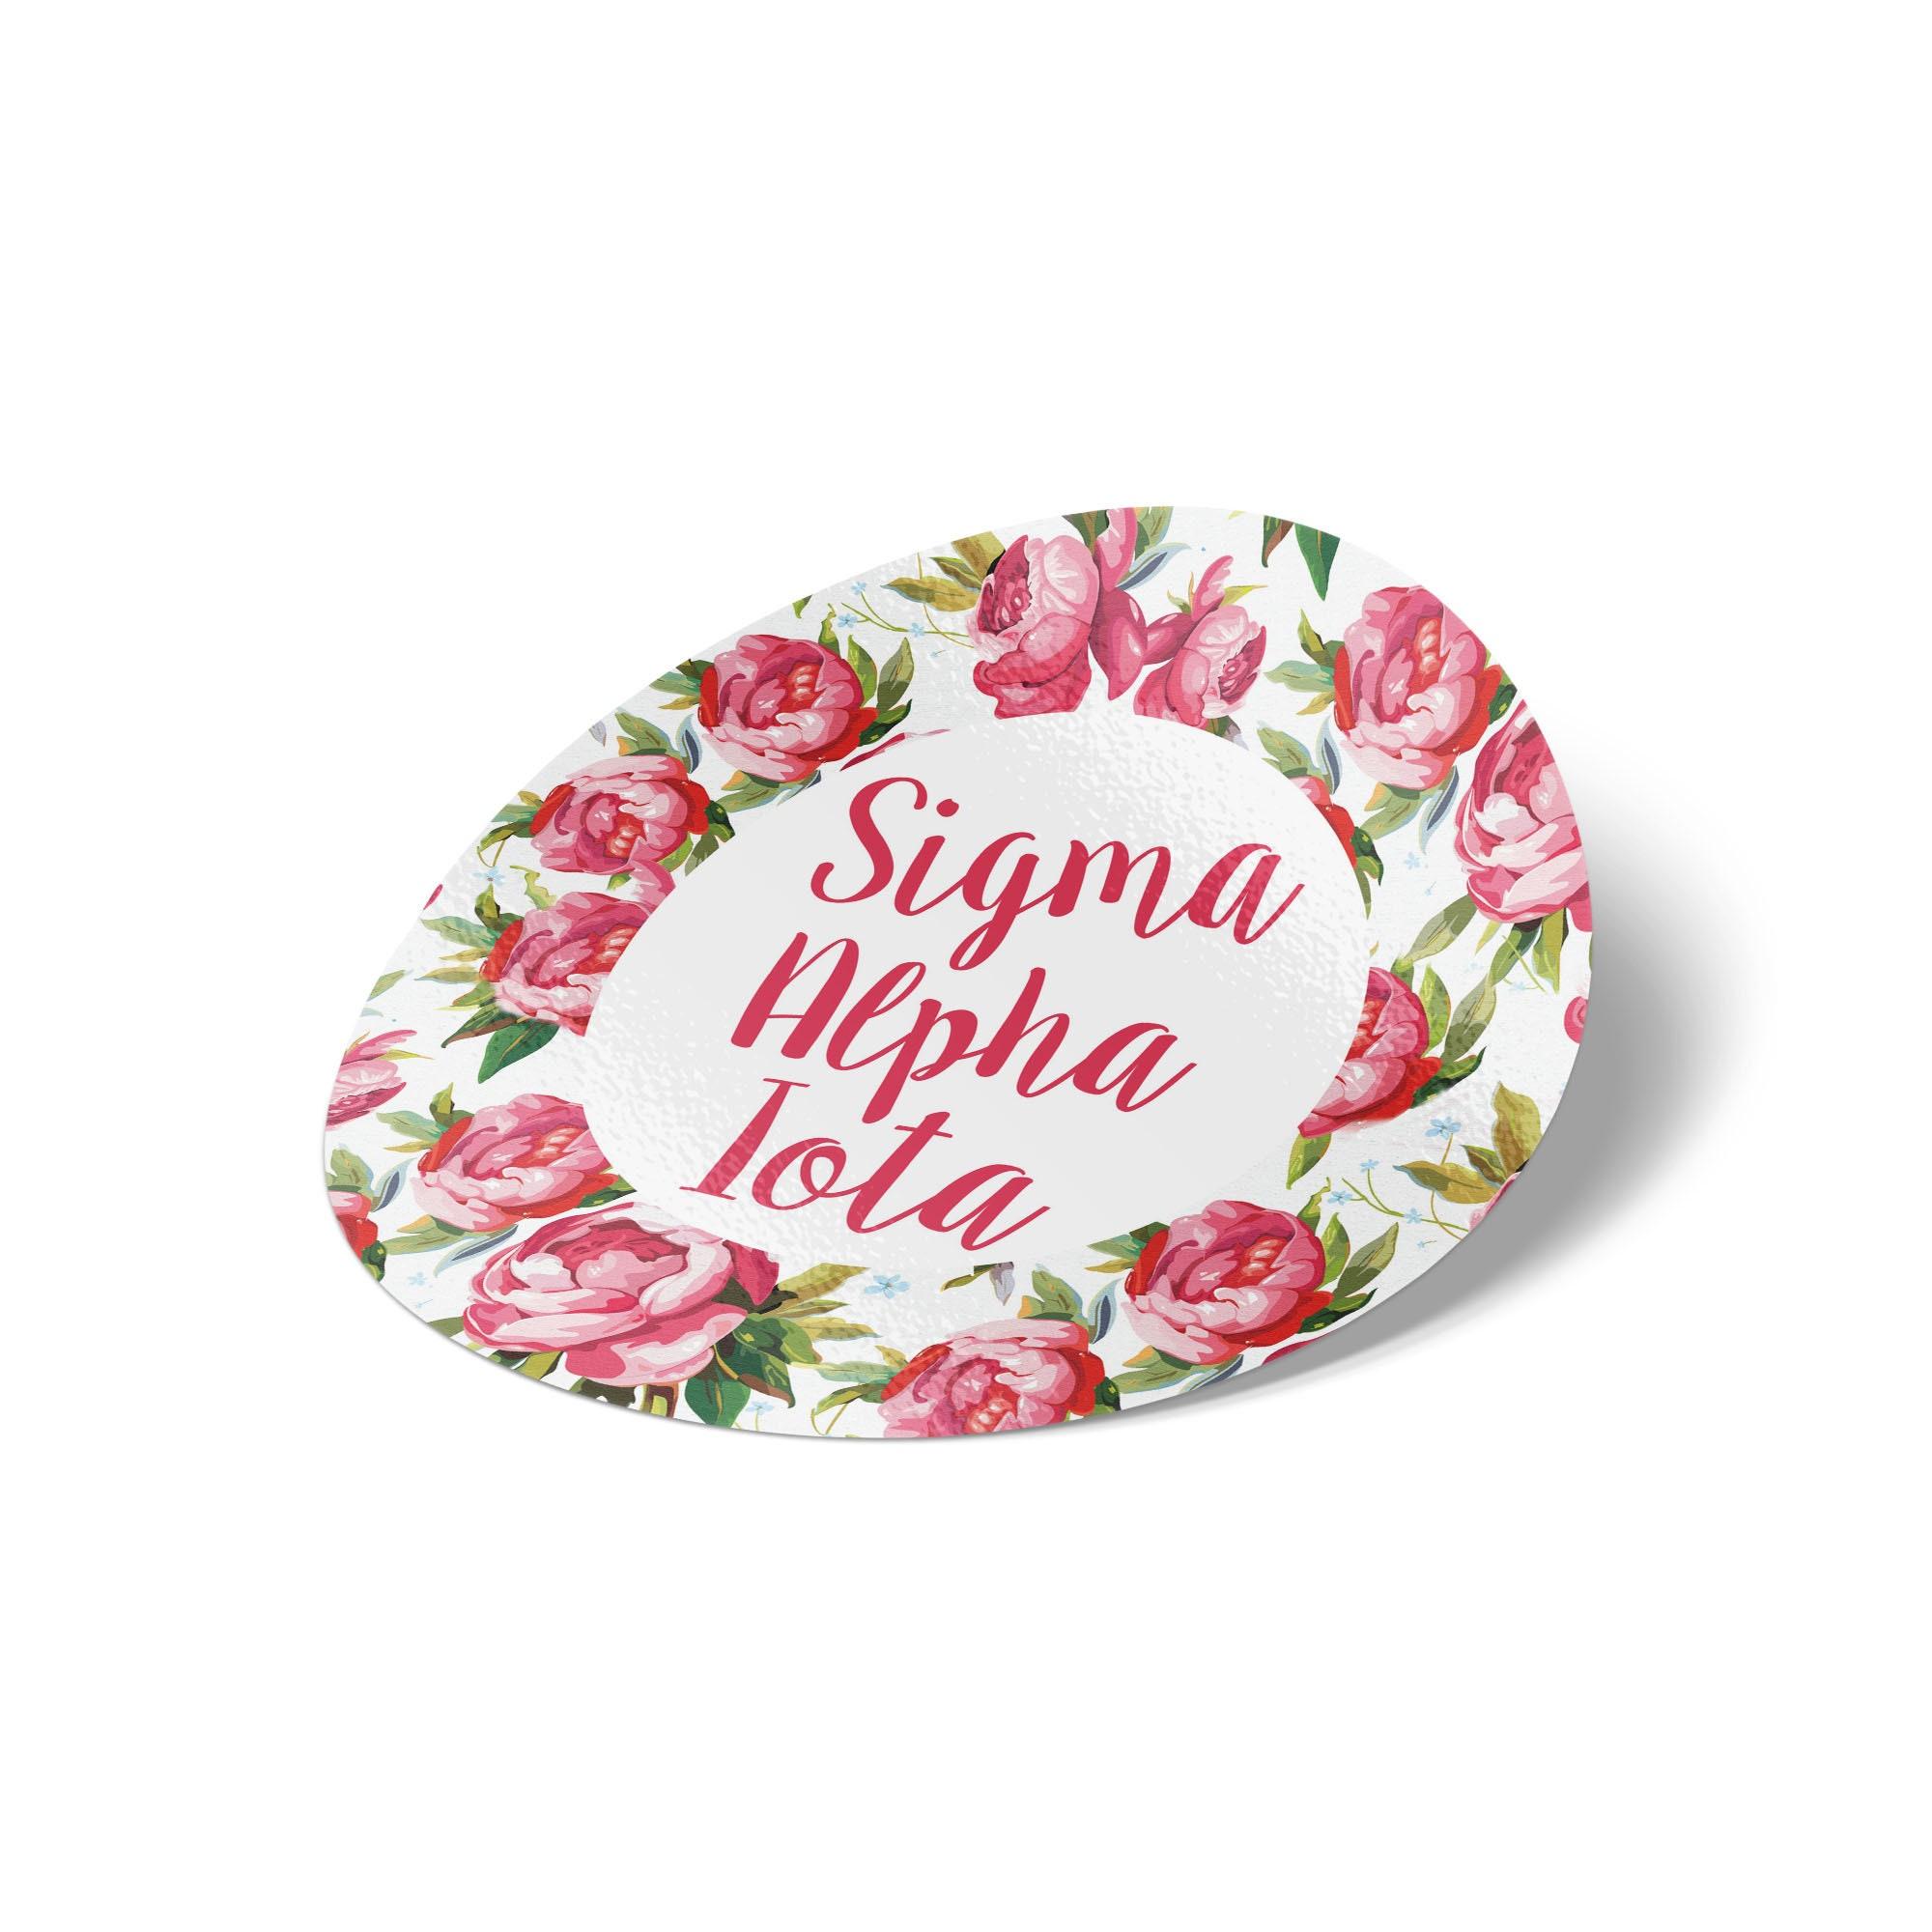 NEW! Sigma Alpha Iota Floral Flag 3/' x 5/'